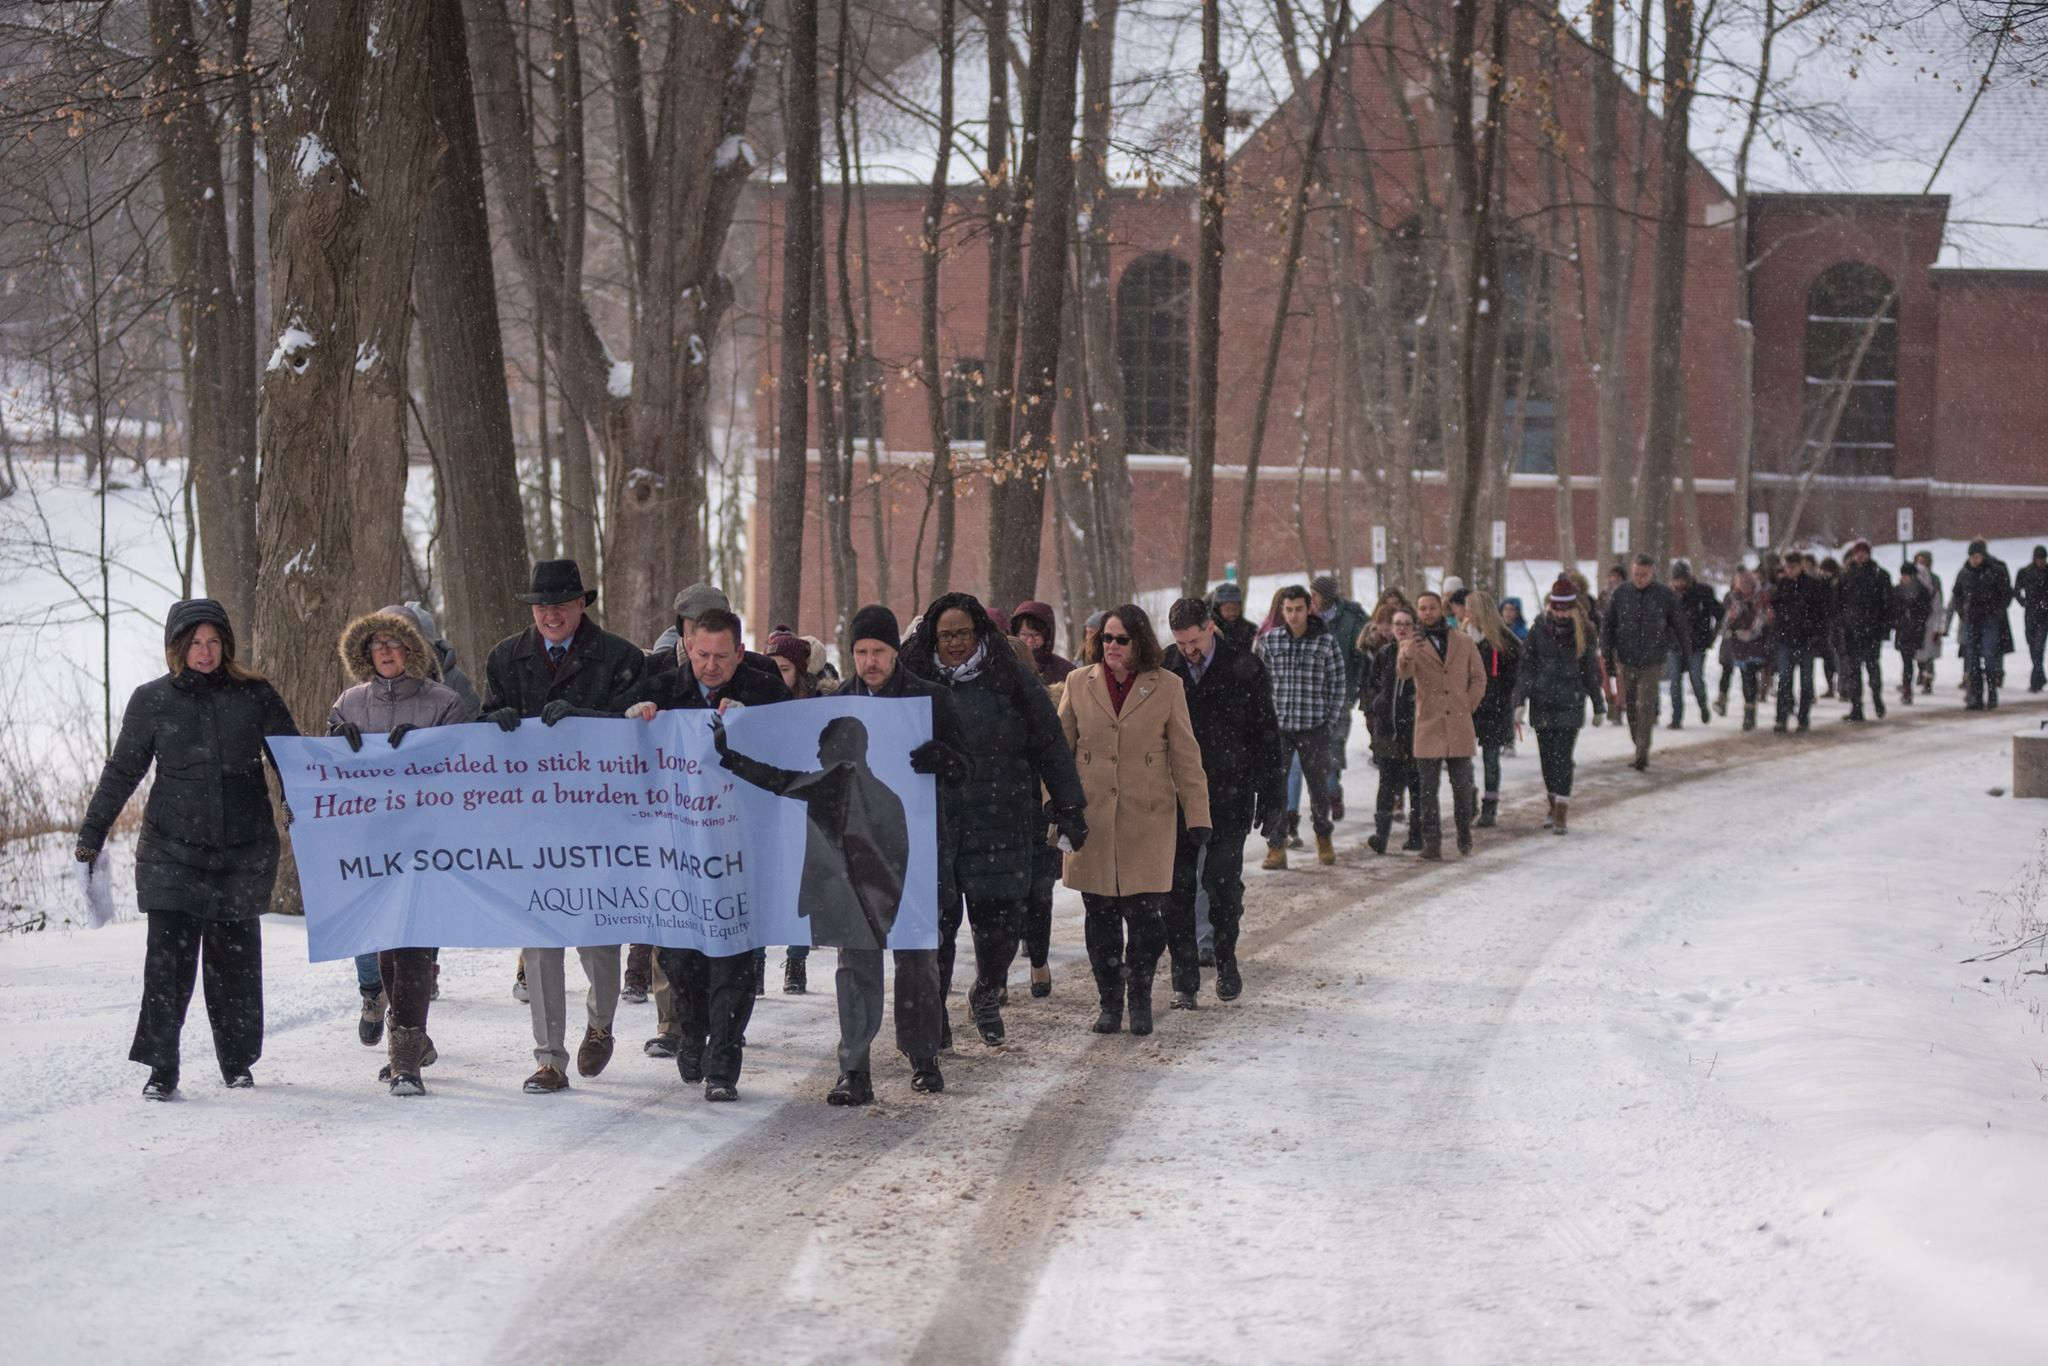 Aquinas College MLK Social Justic March